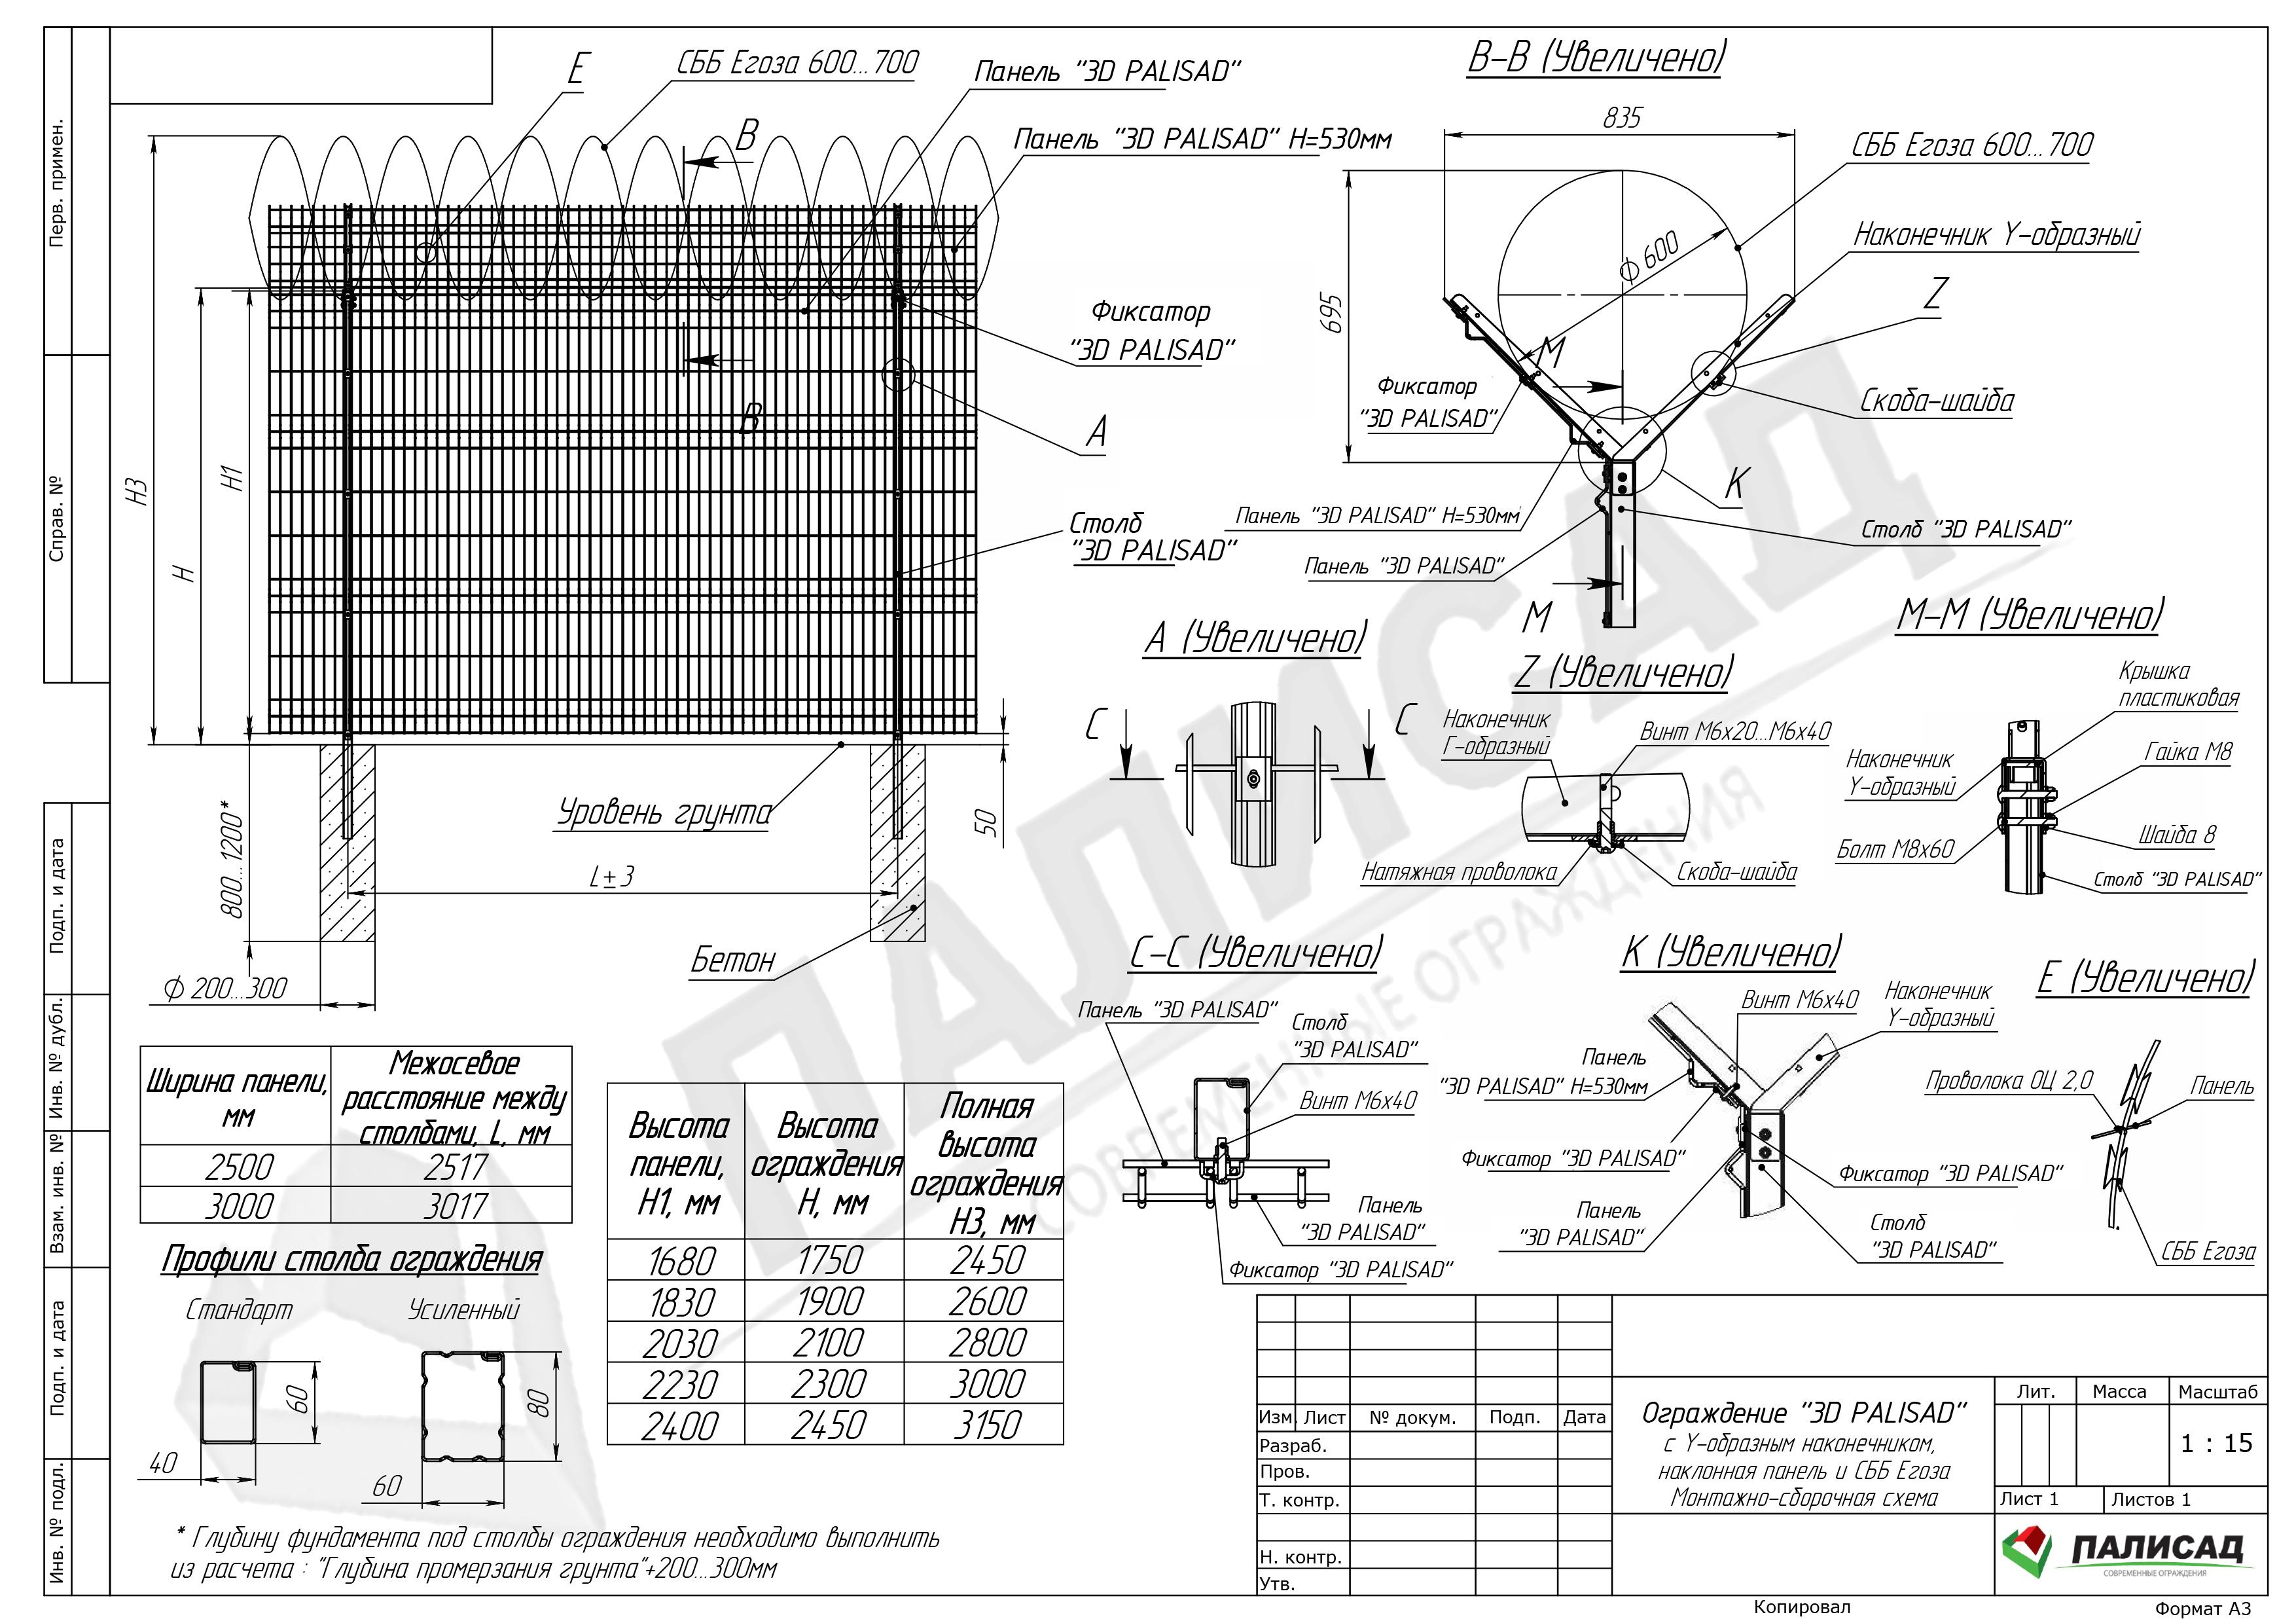 Класик-11-(ТОК_1,7-2,4-Ст-Y-ПАН-СББ-01)(PDF)